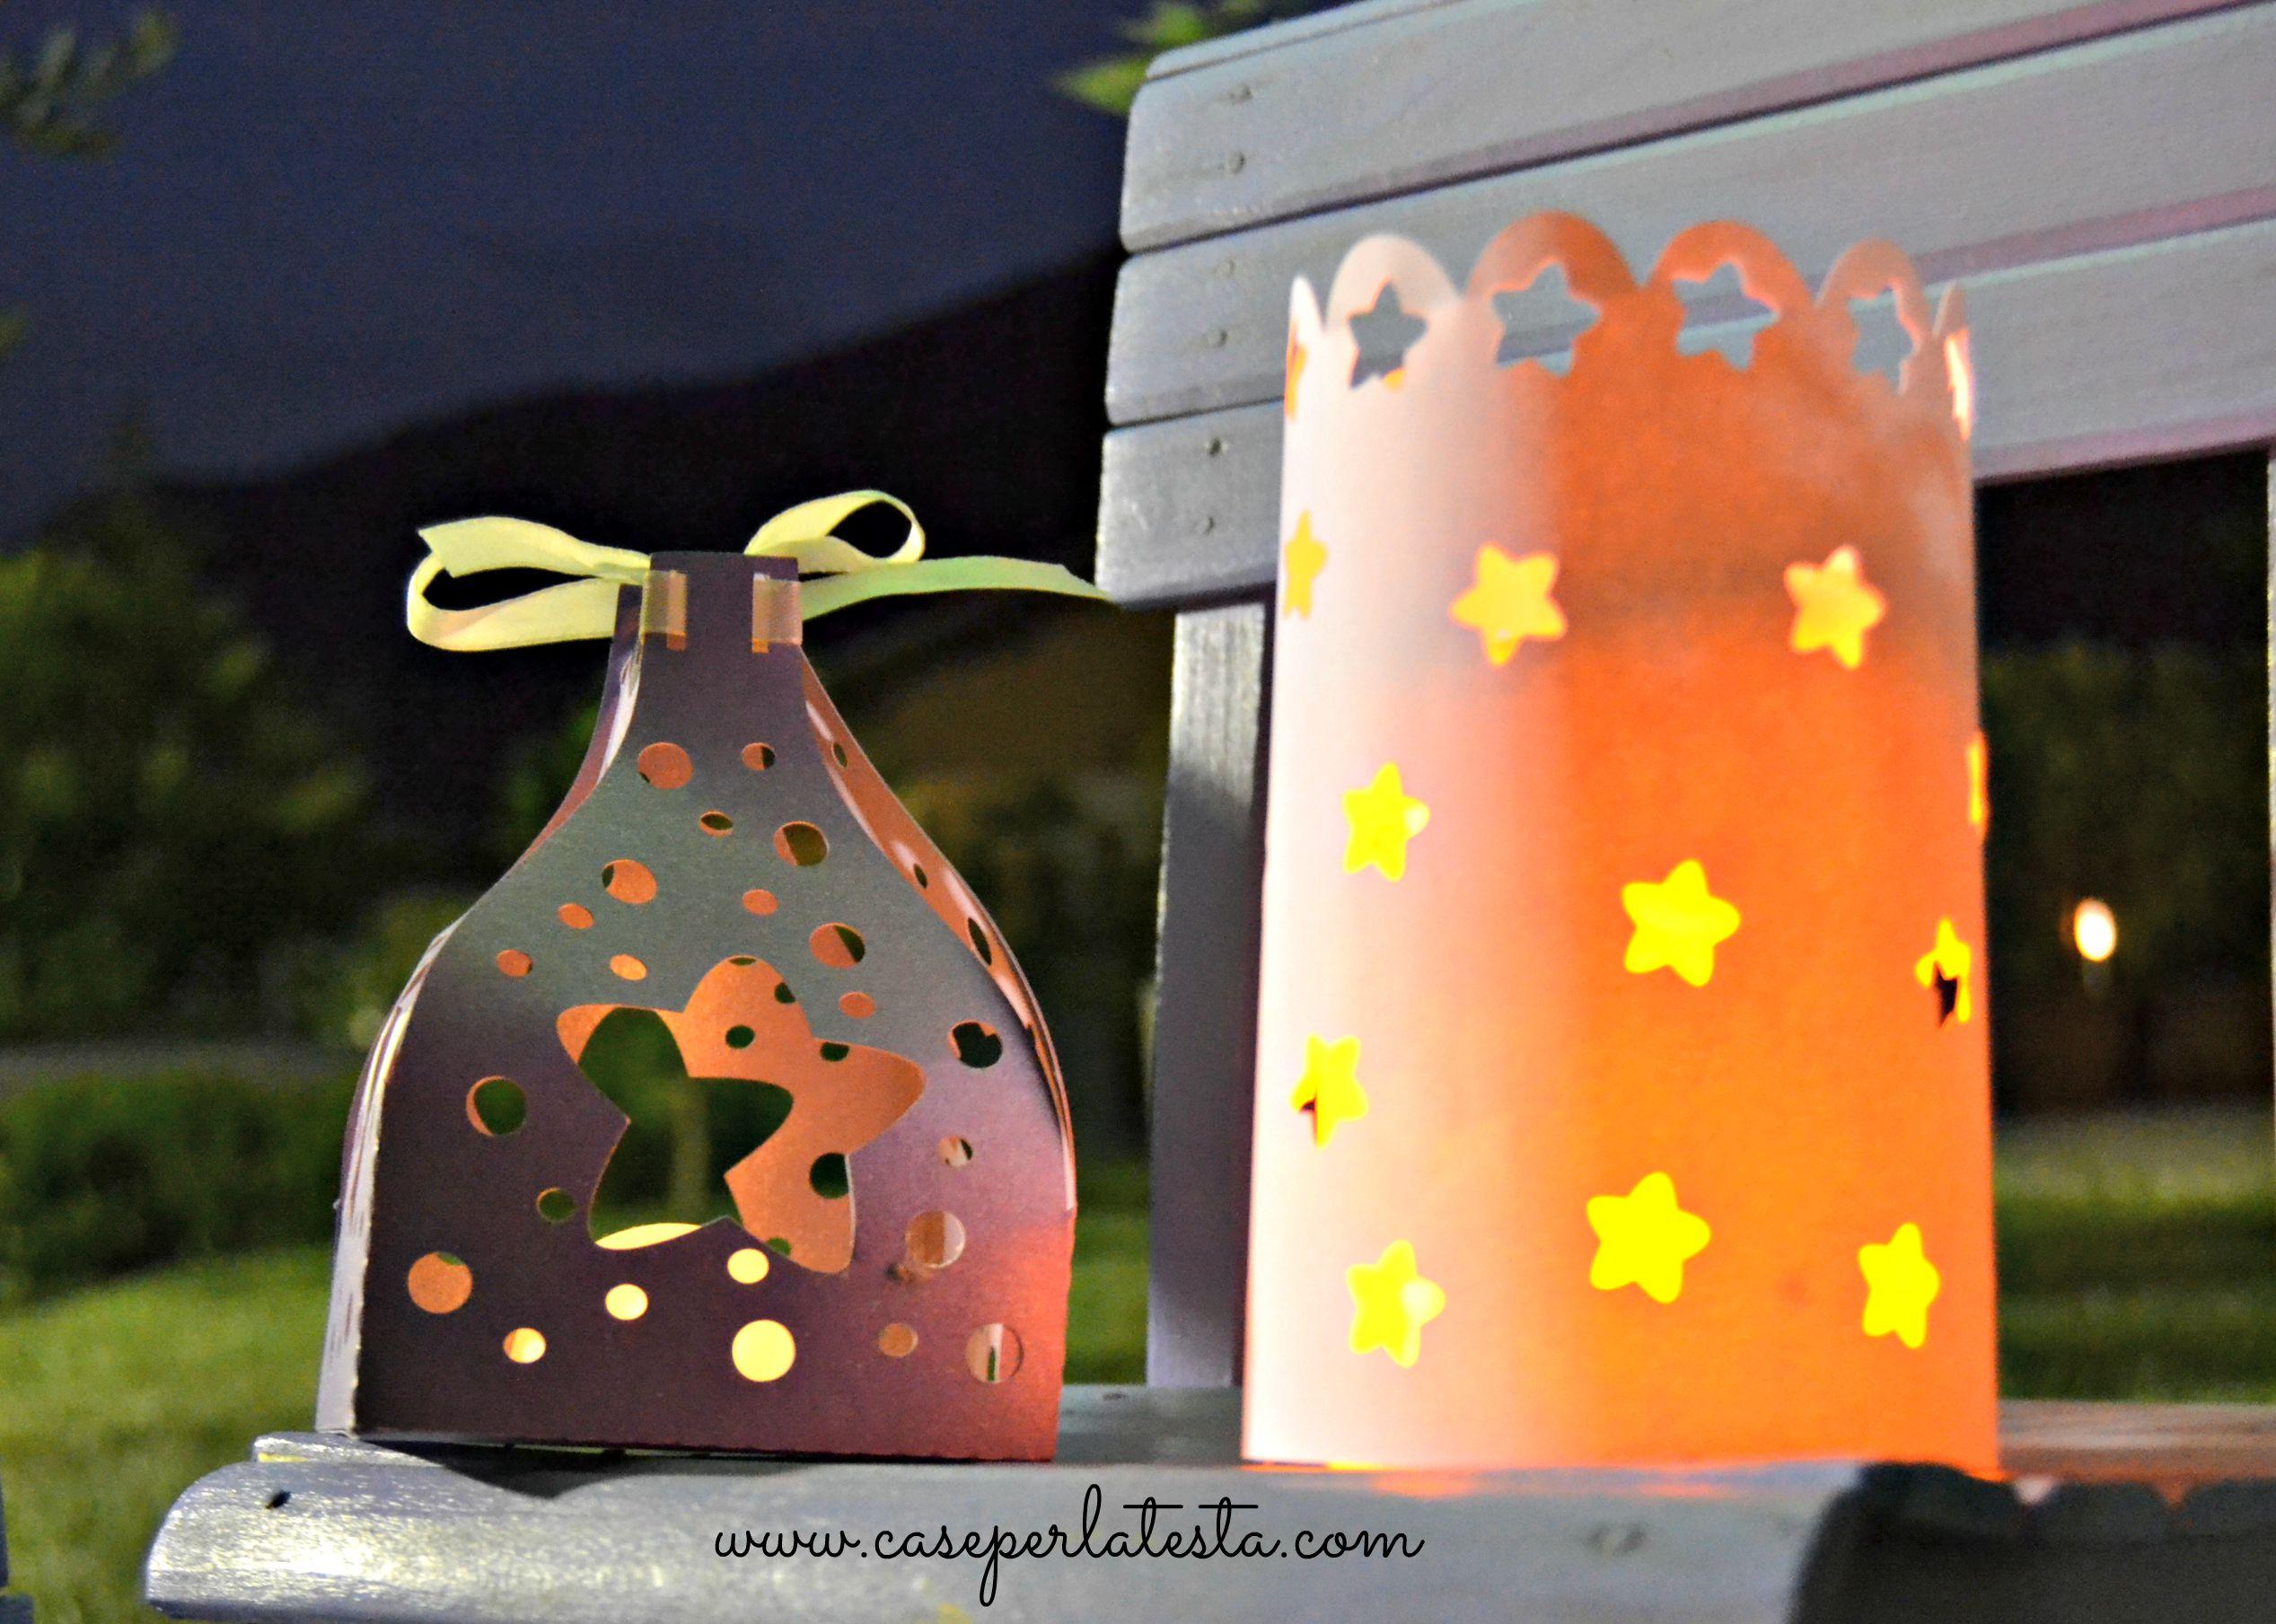 Lanterne di carta fai da te per le sere d'estate * DIY paper lanterns for summer nights ...